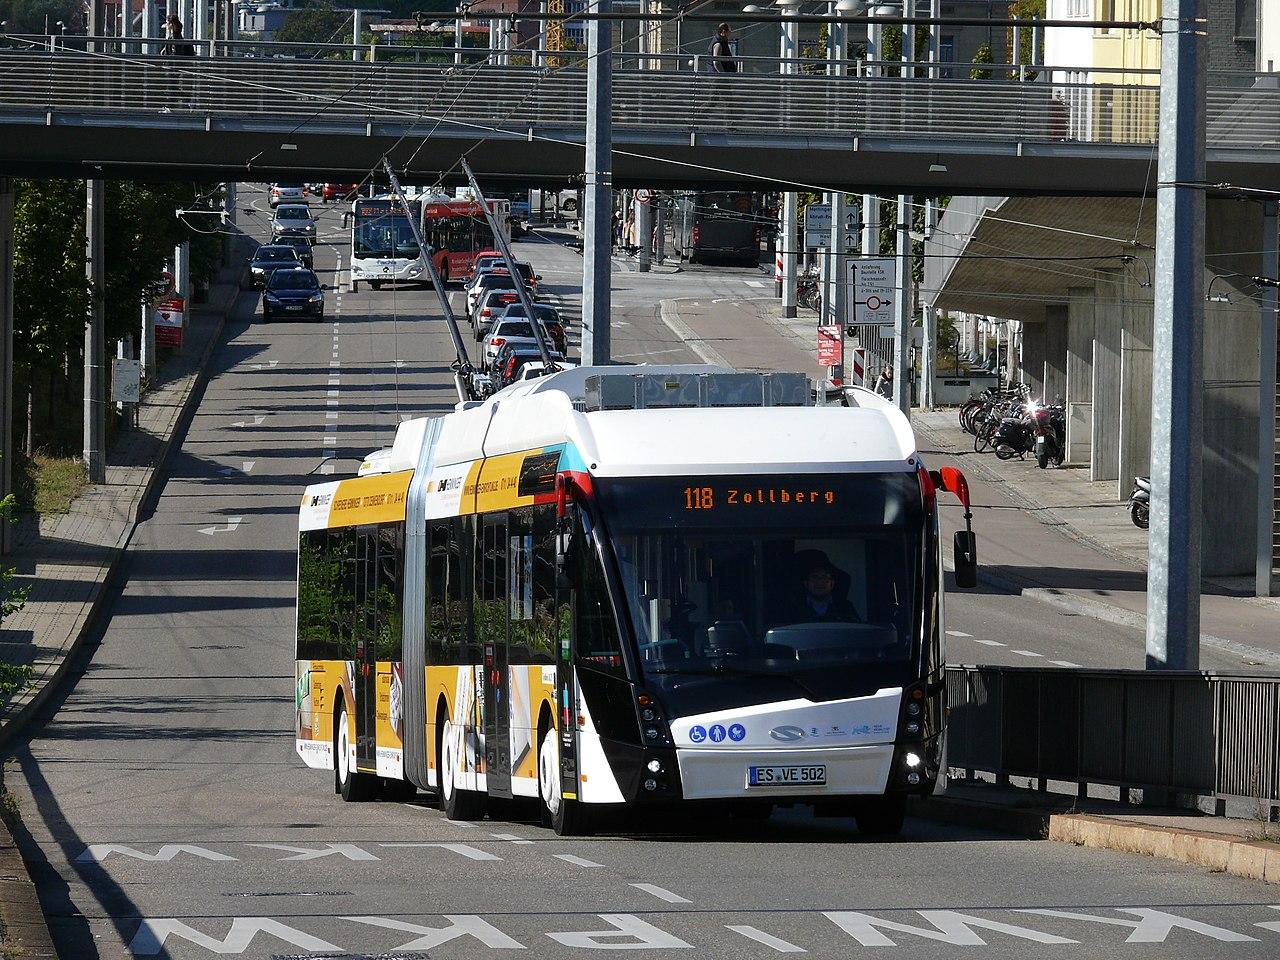 Trolejbus v Esslingenu. (foto: Silesia711/Wikipedia.org)